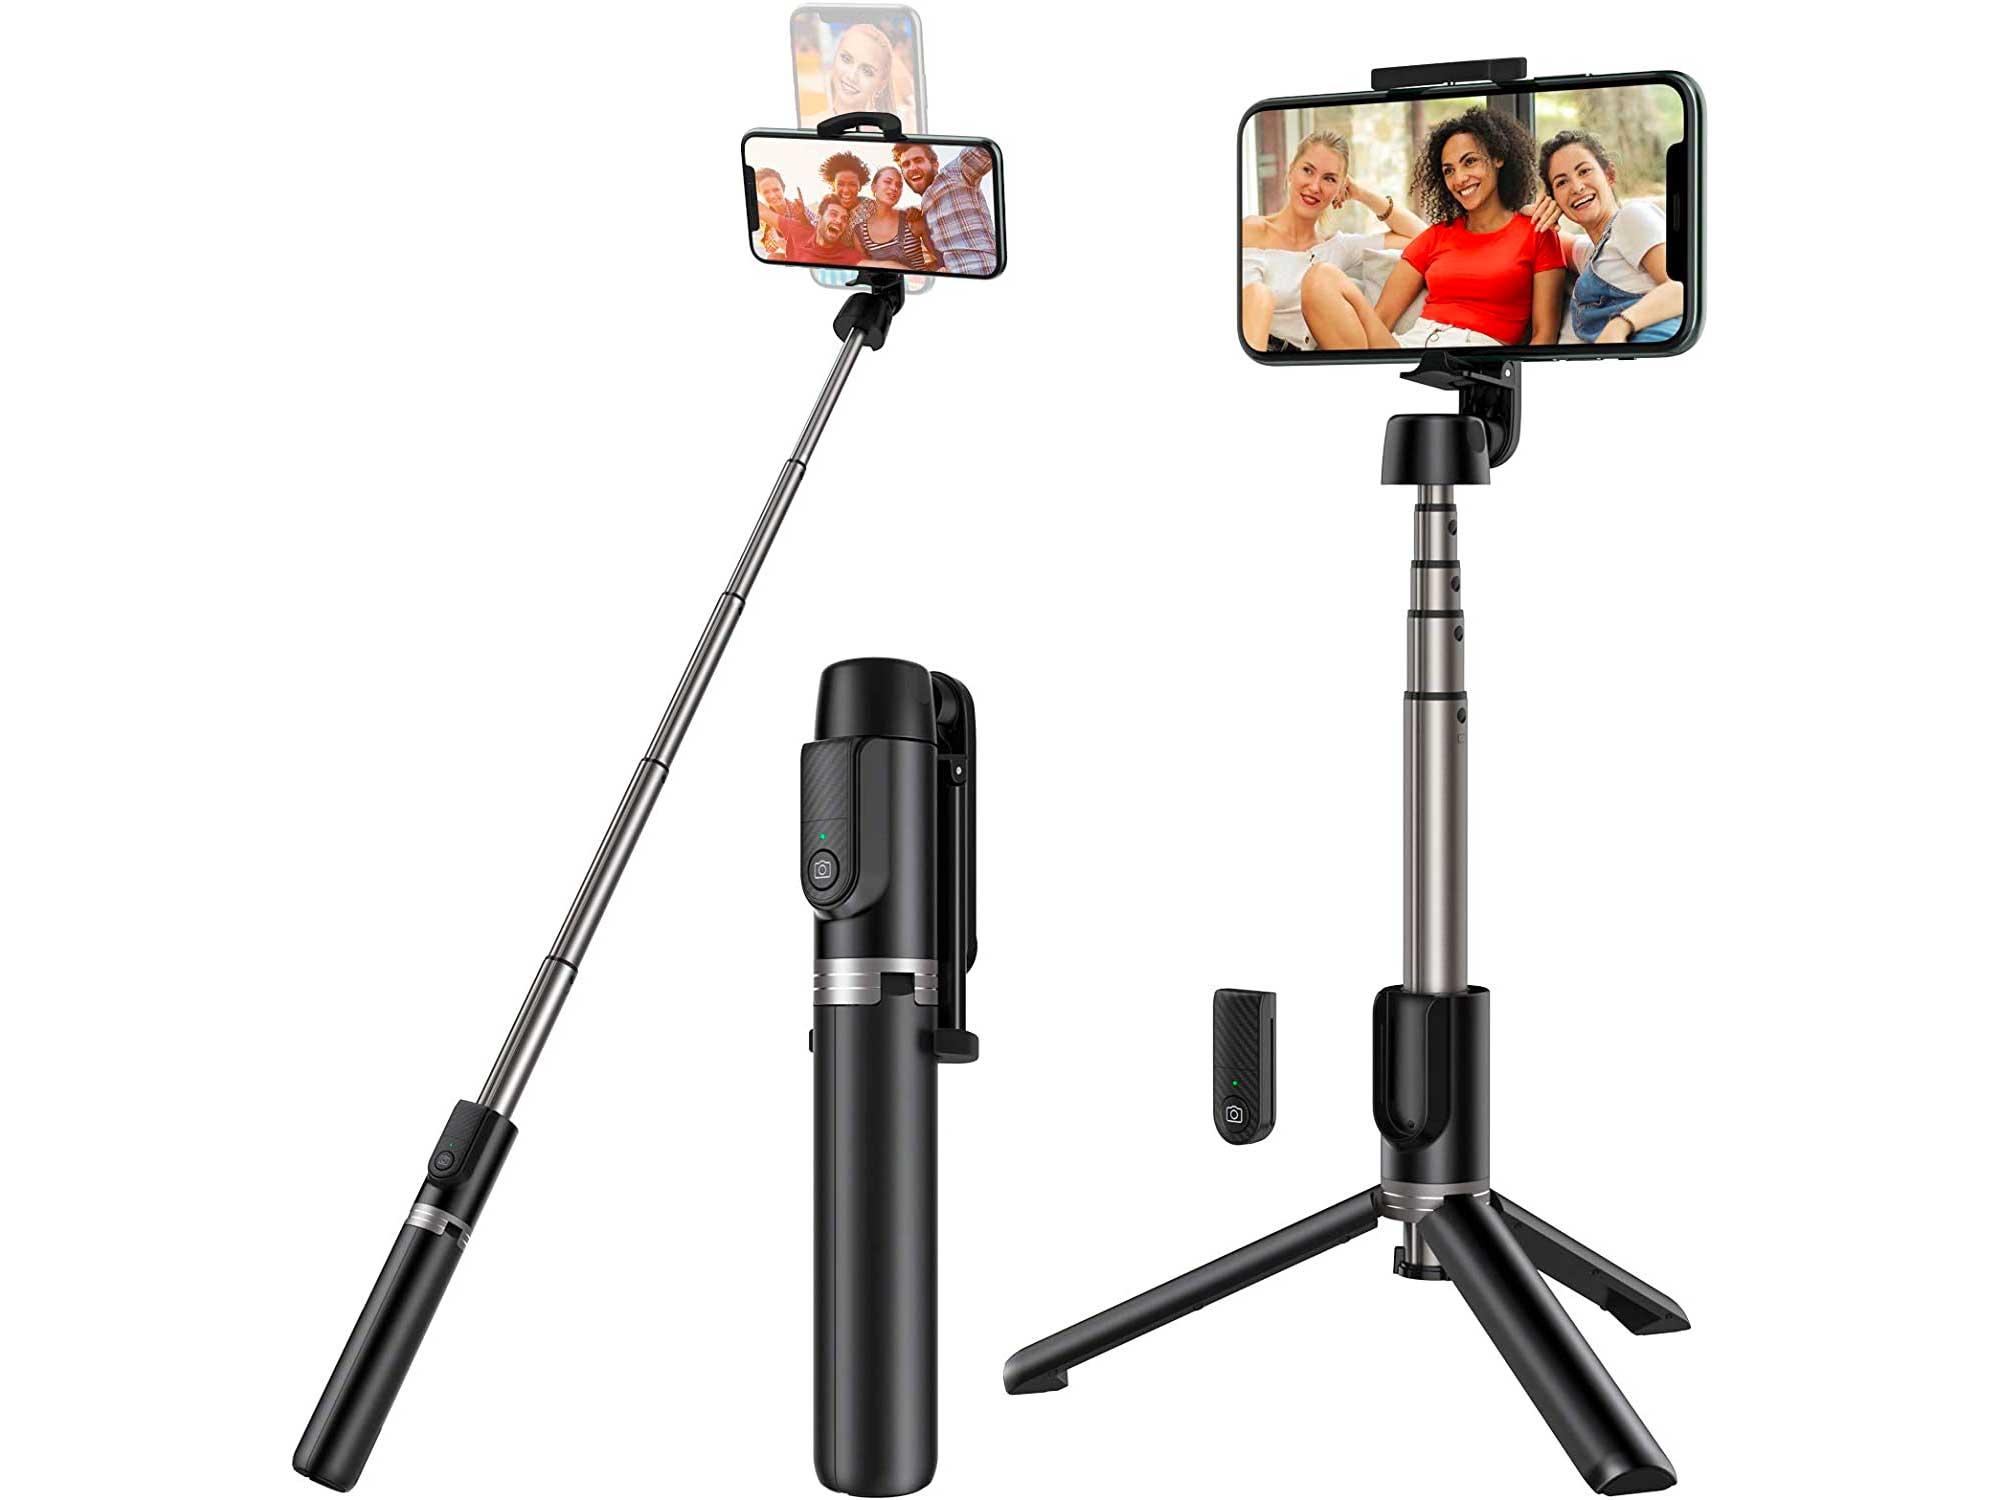 Yoozon Selfie Stick Tripod Bluetooth,Extendable Phone Tripod Selfie Stick with Wireless Remote Shutter